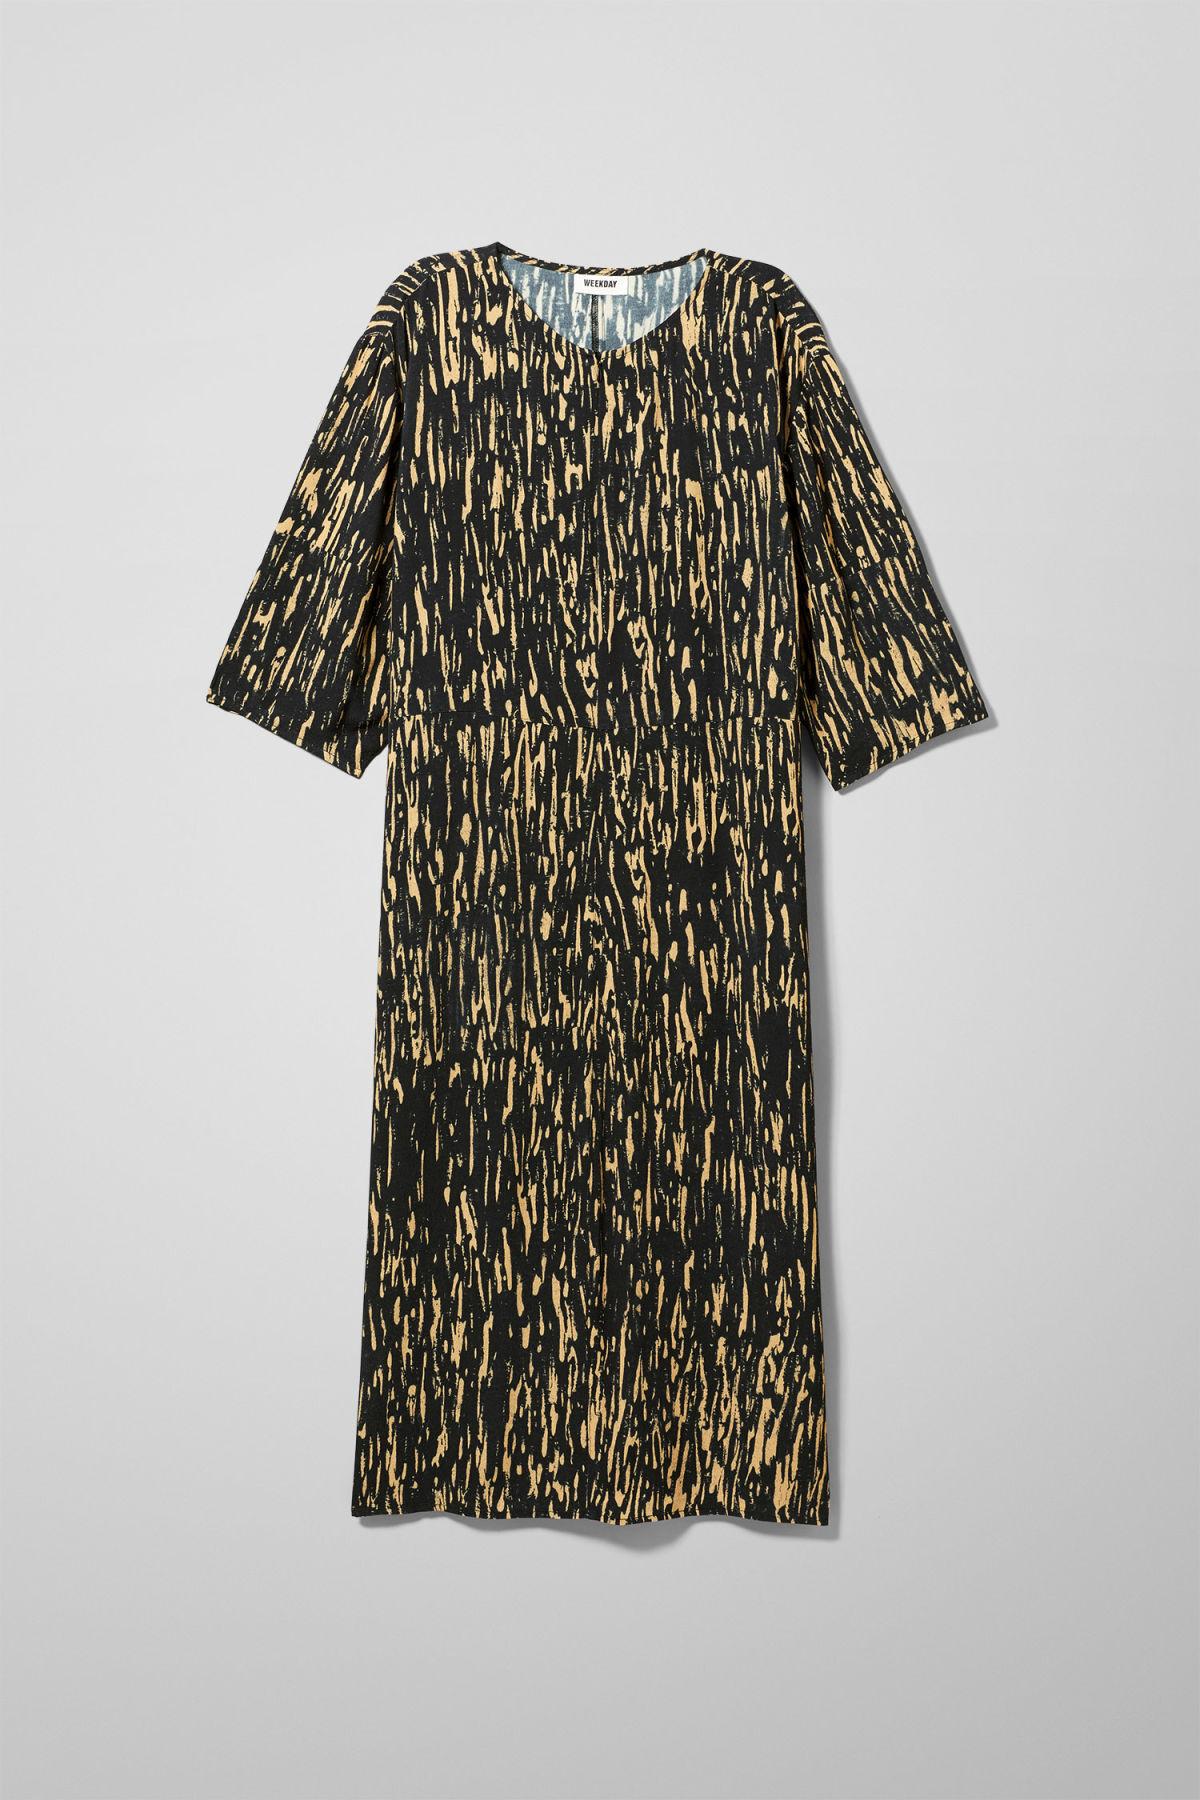 Image of Cara Dress - Black-M